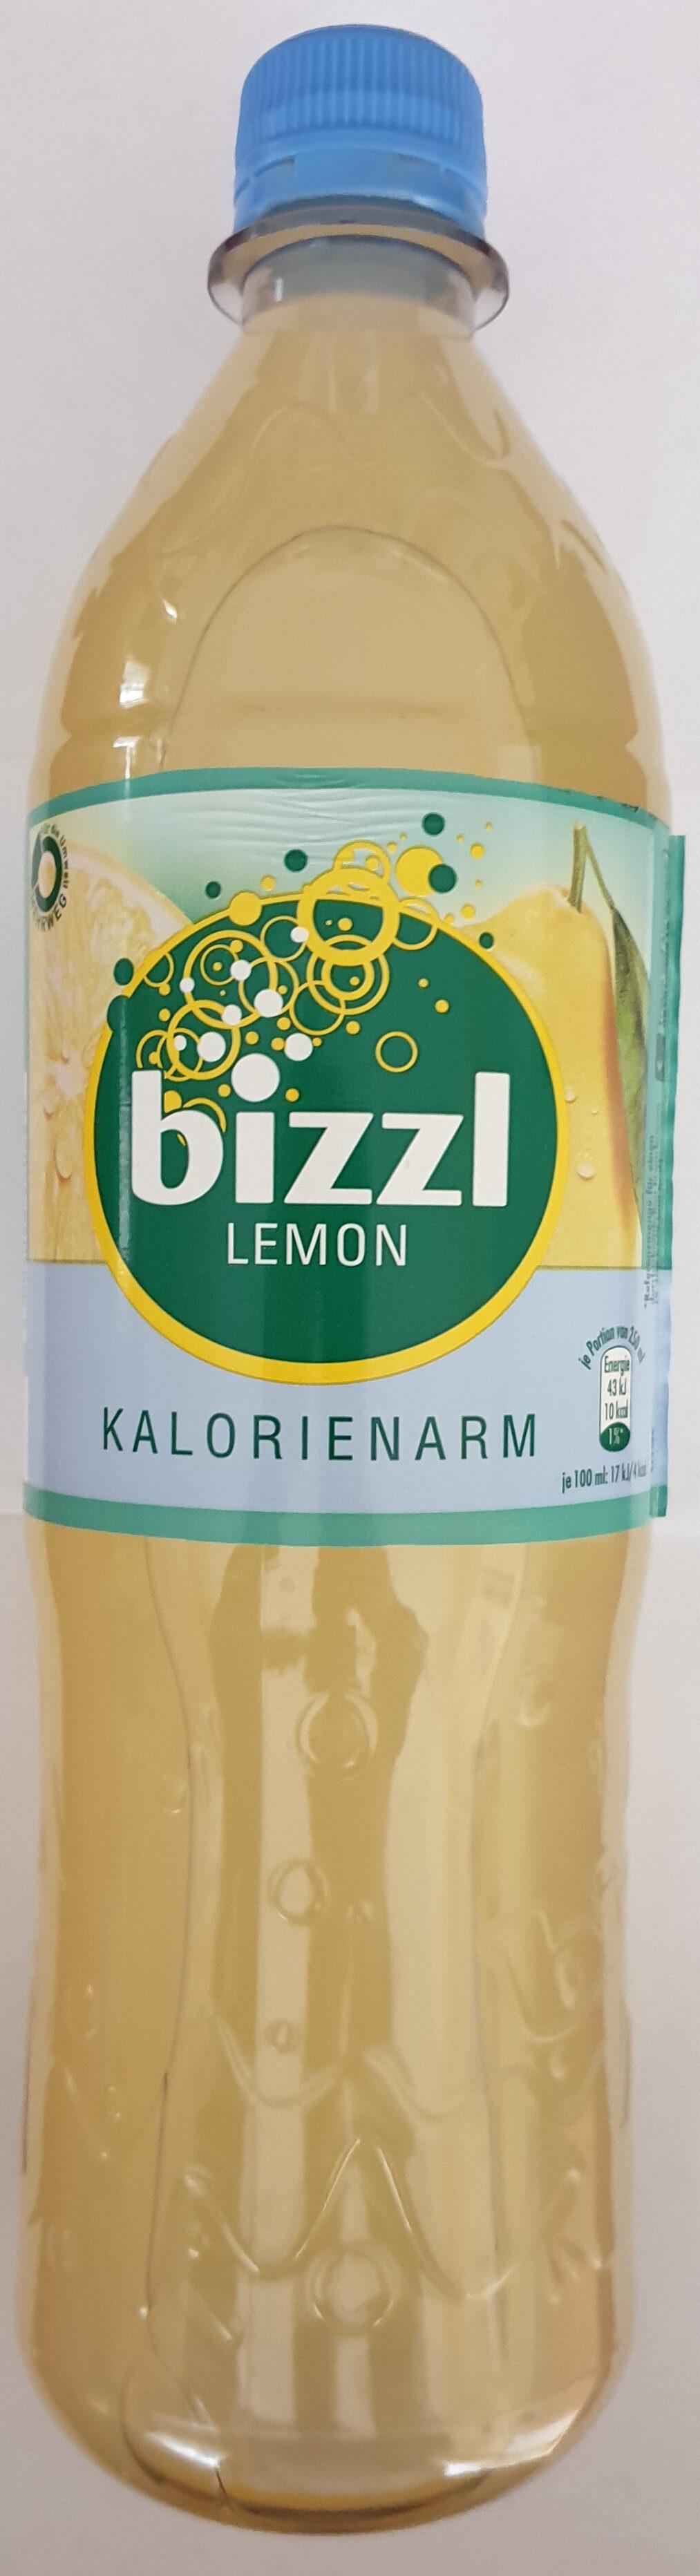 Lemon kalorienarm - Produkt - de